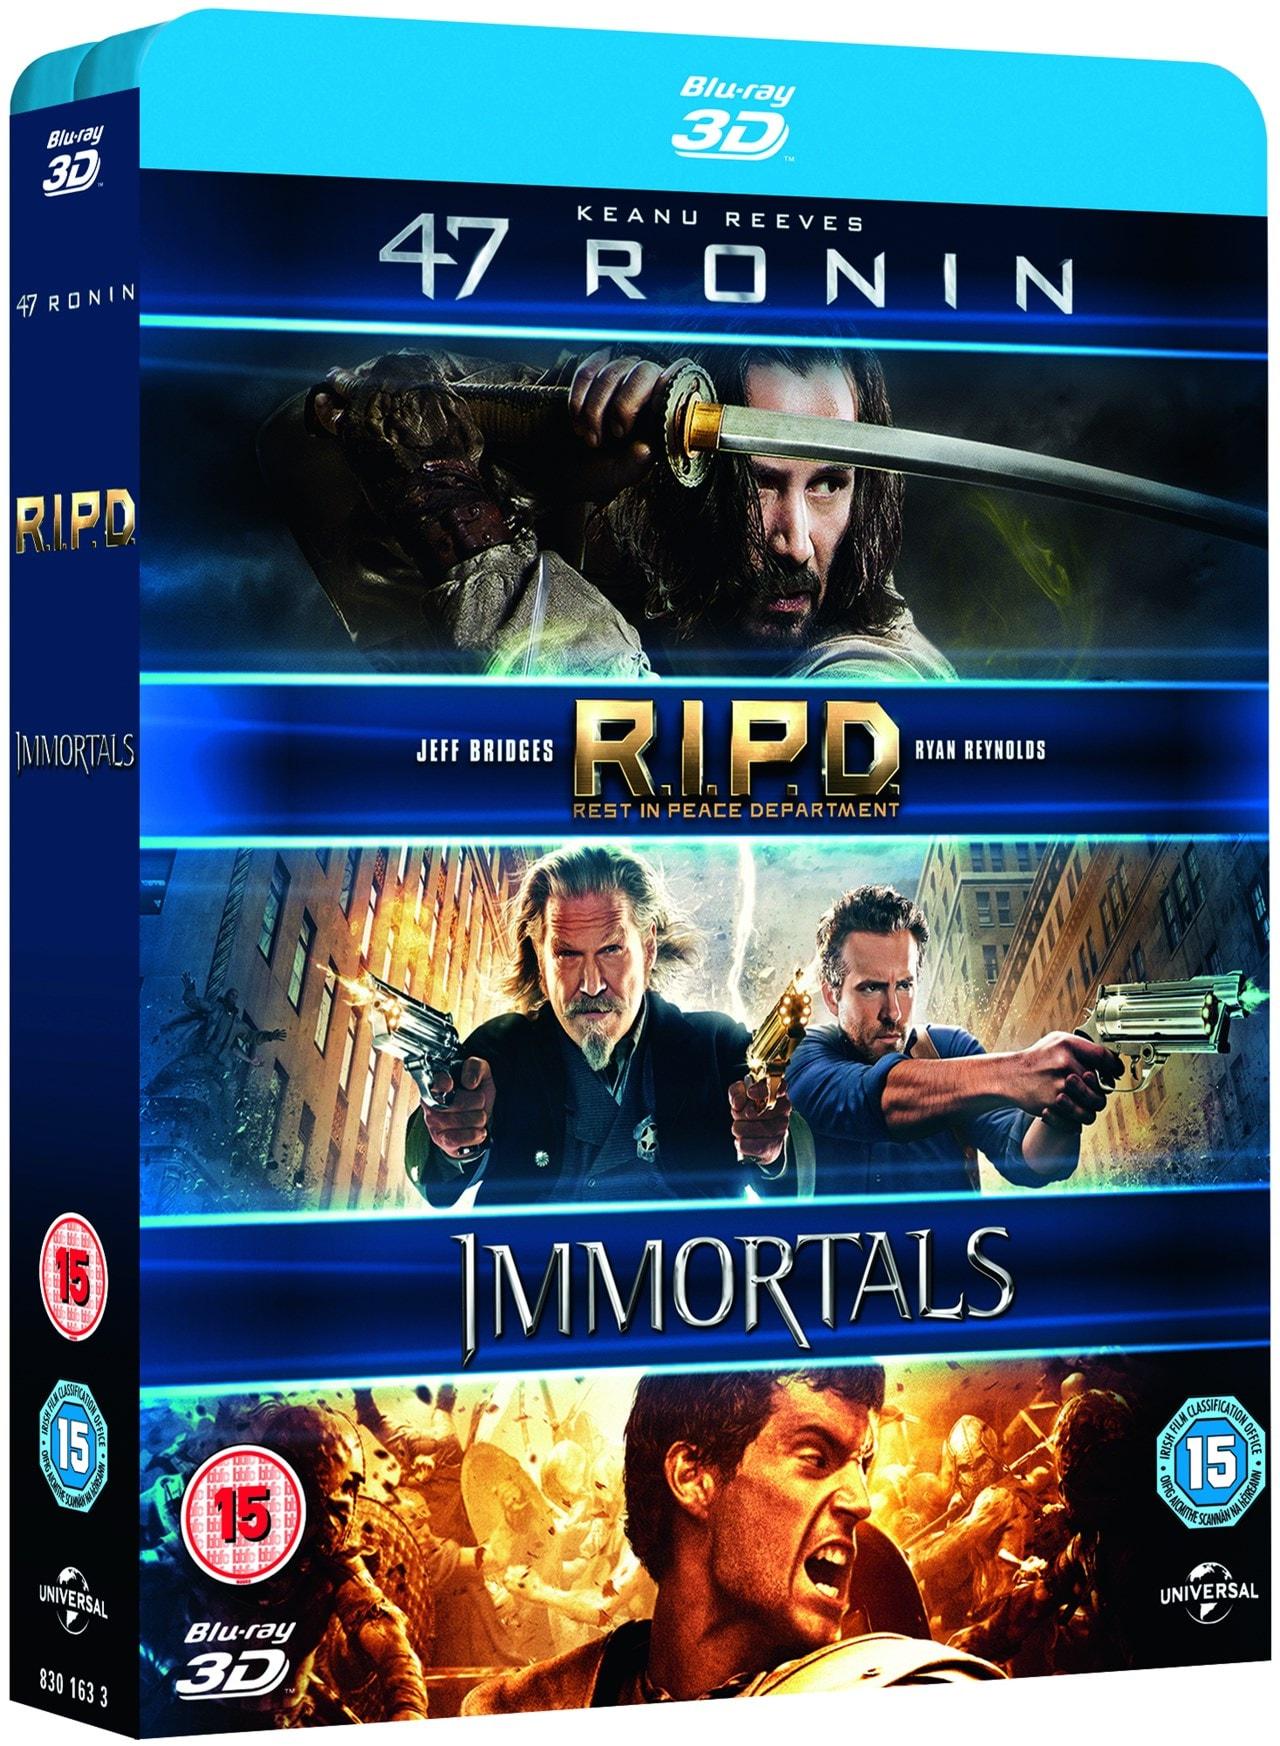 47 Ronin/RIPD/Immortals - 2